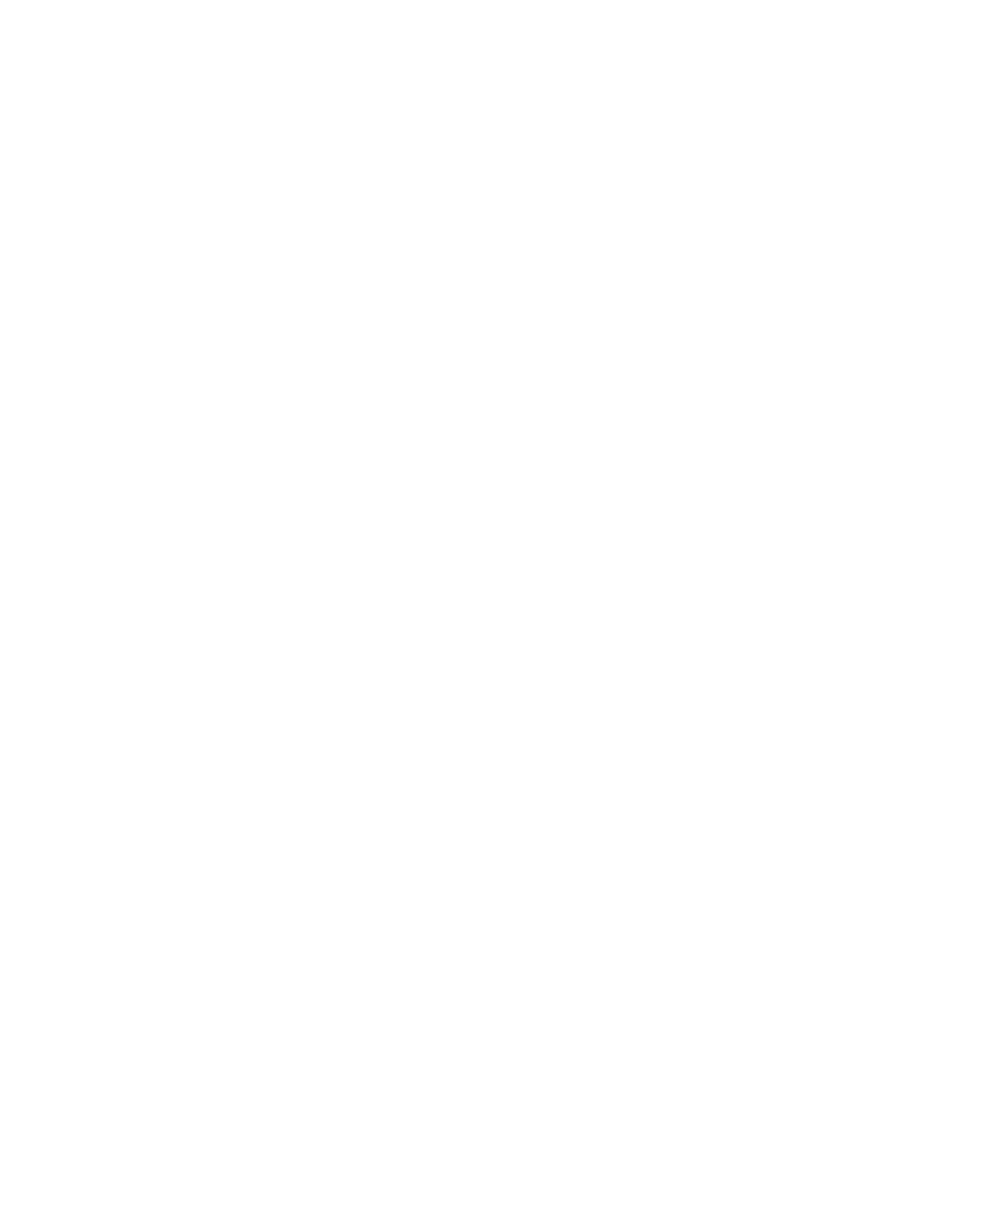 Digisome_logo_valkoinen_teksti.png